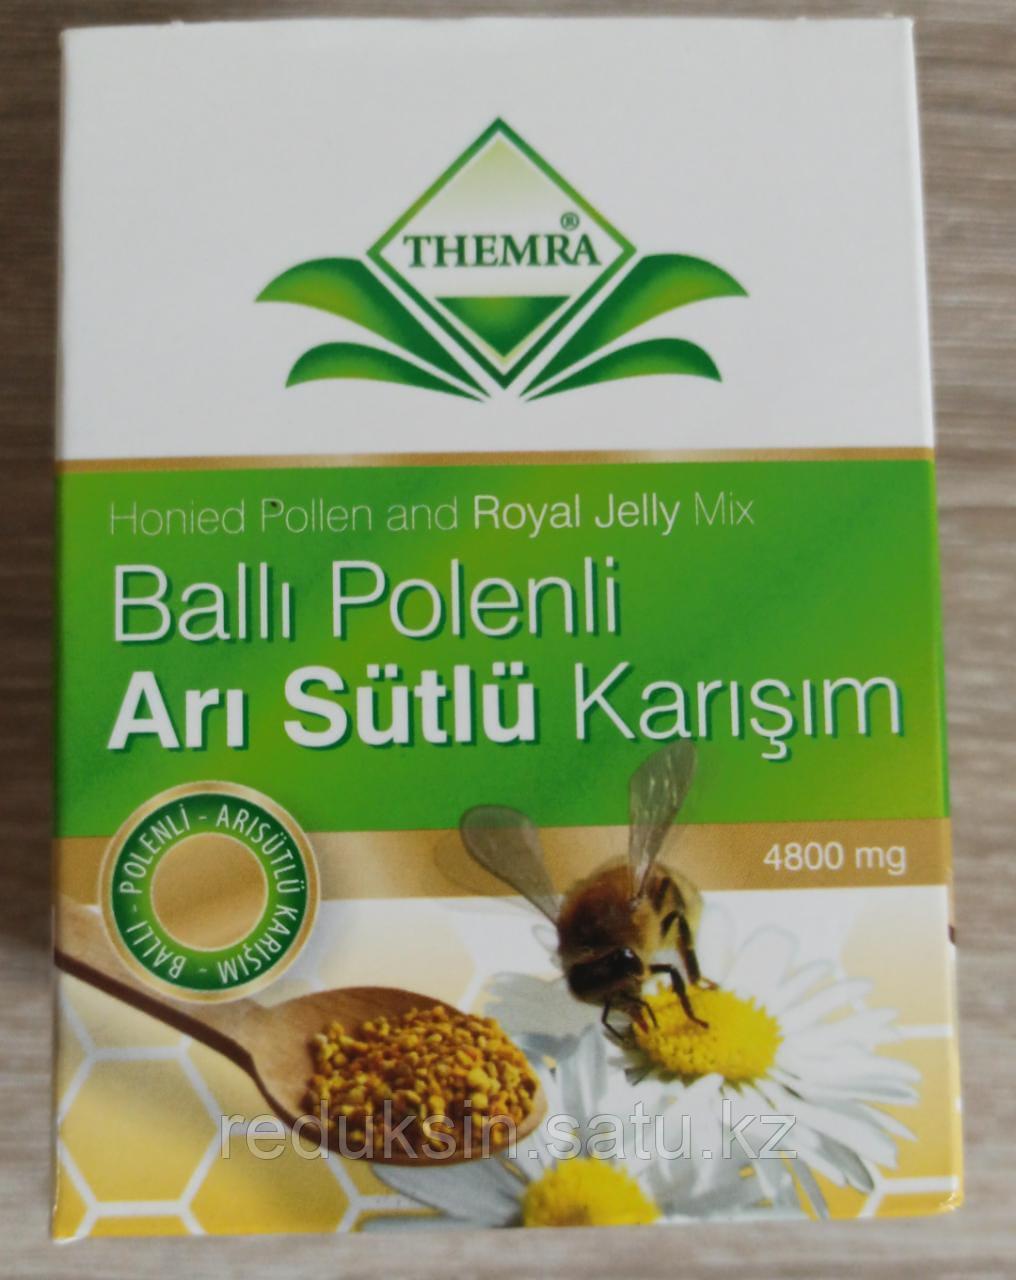 Balli Polenli ari Sutlu Karisim от Themra - Детская эпимедиумная паста Themra